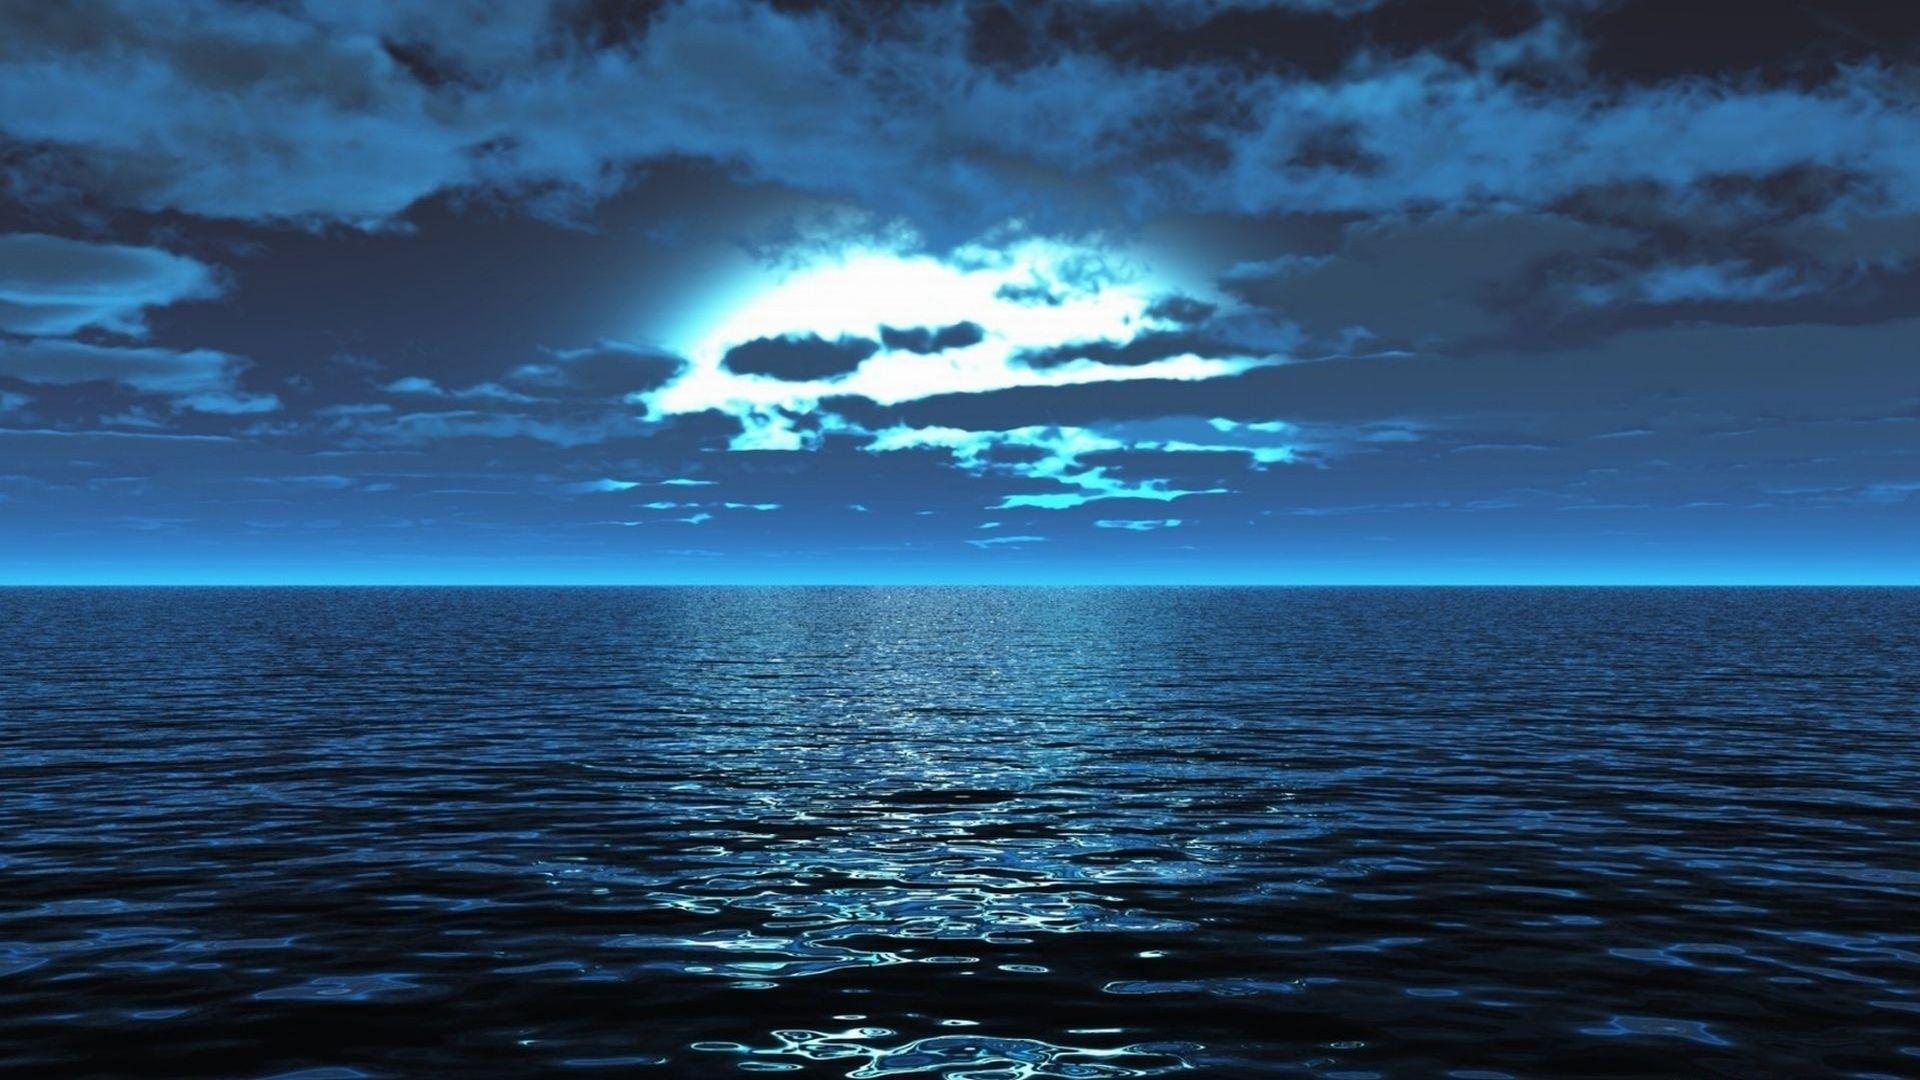 Sea Surface Calm Smooth Light Night